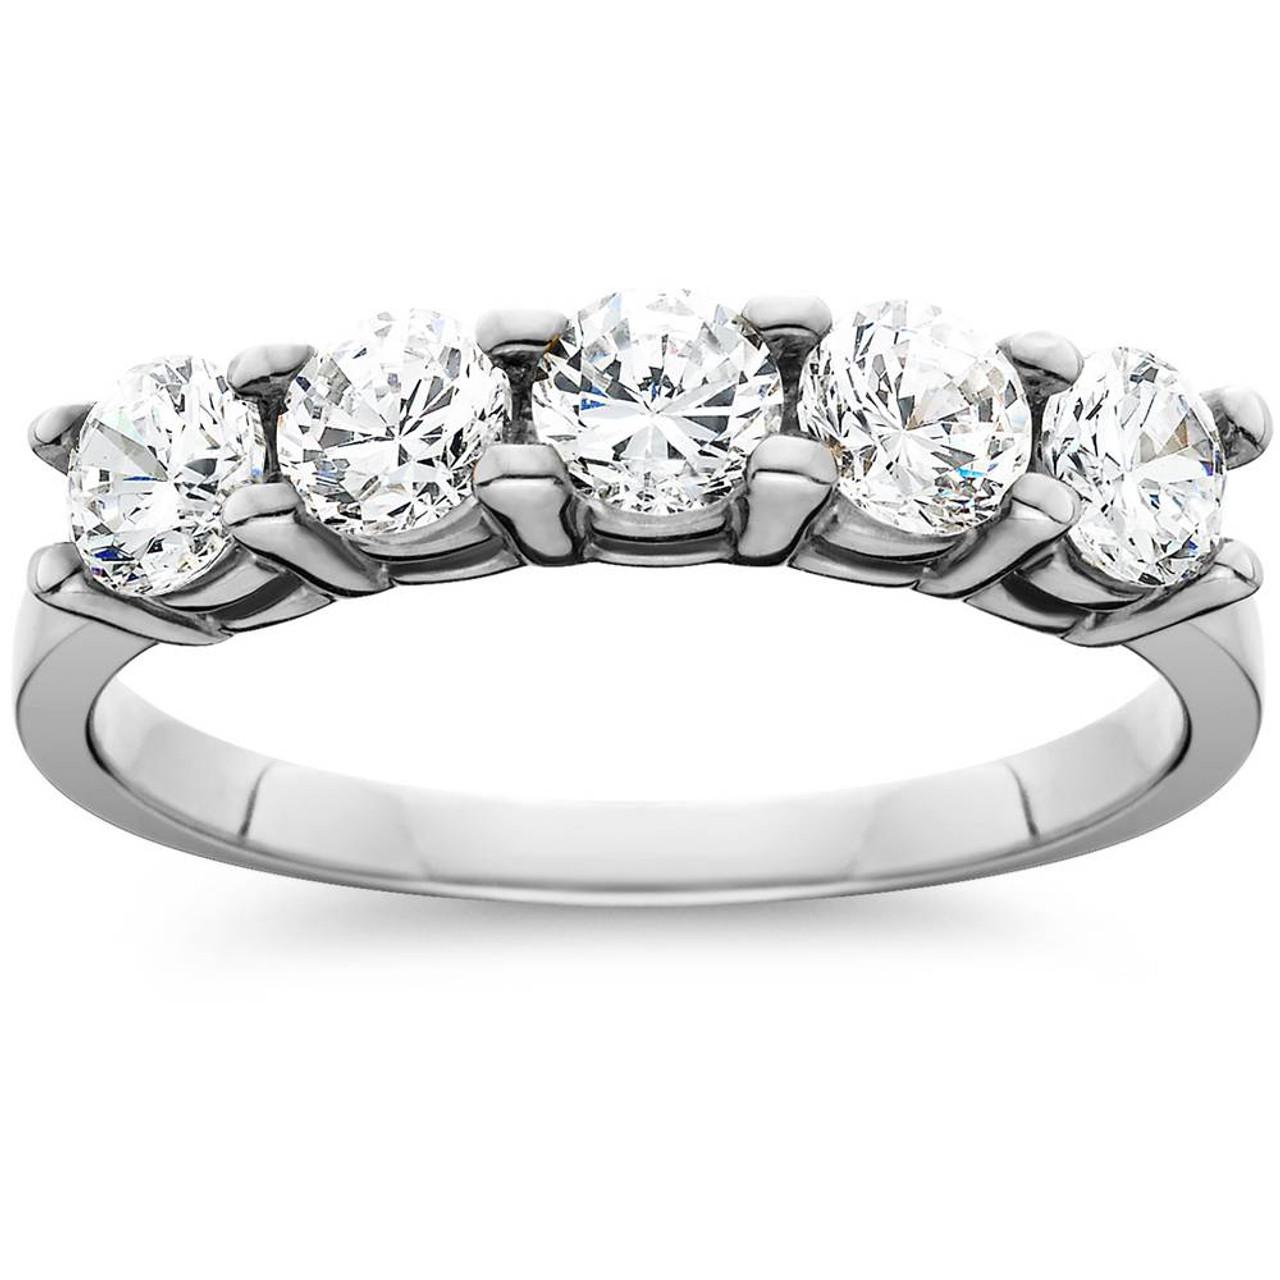 Bezel Set Ring Black Diamond Wedding Ring Genuine Diamond Ring Anniversary Ring Five Stone Ring Half Eternity Ring Stackable Ring